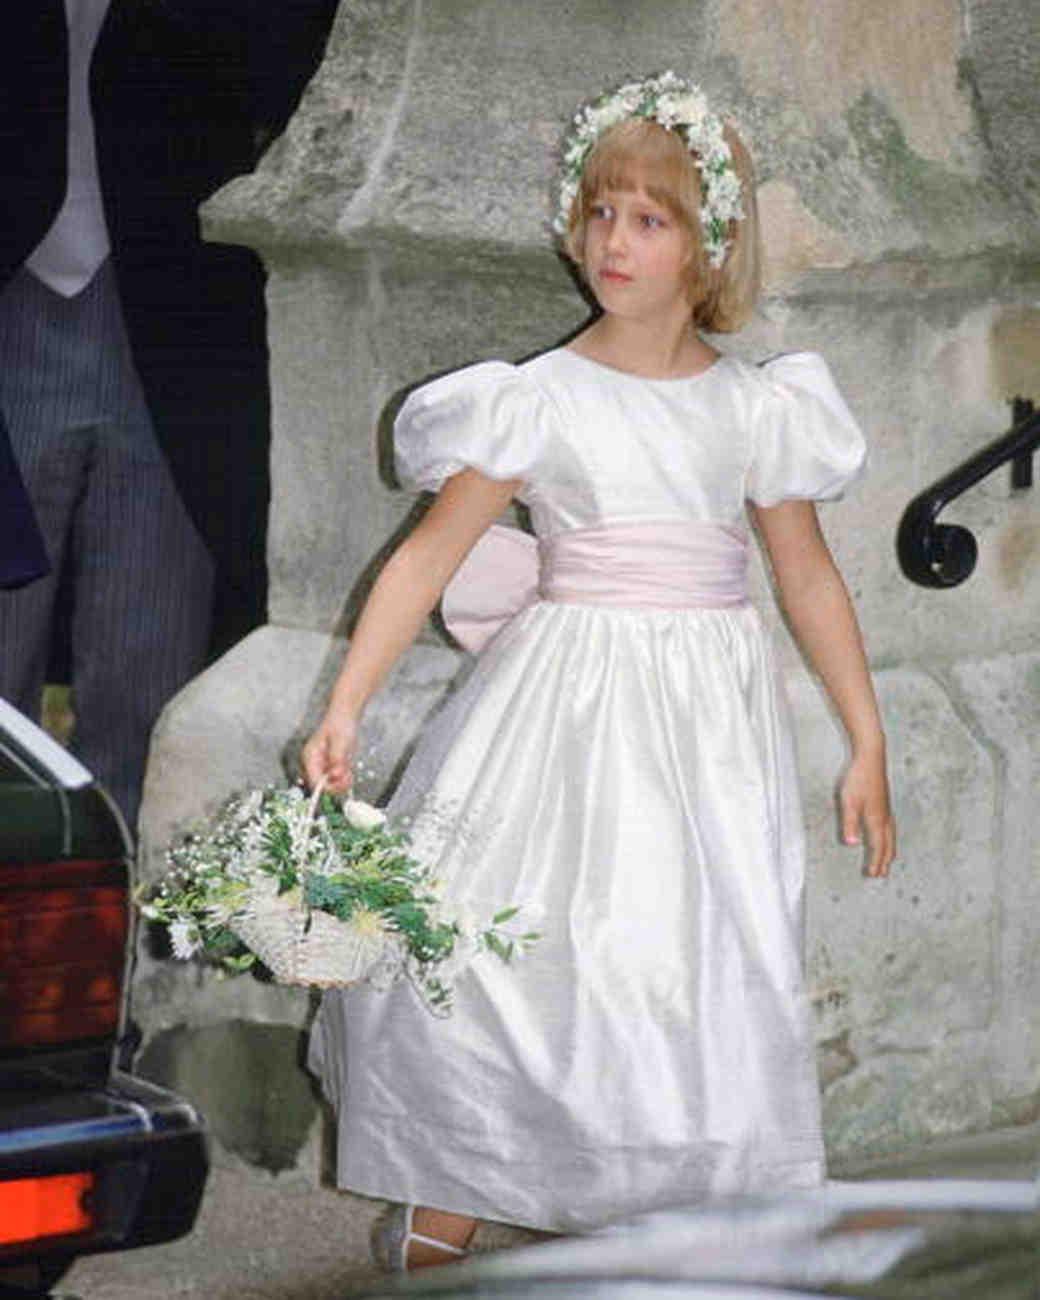 royal-children-wedding-52117649-0415.jpg